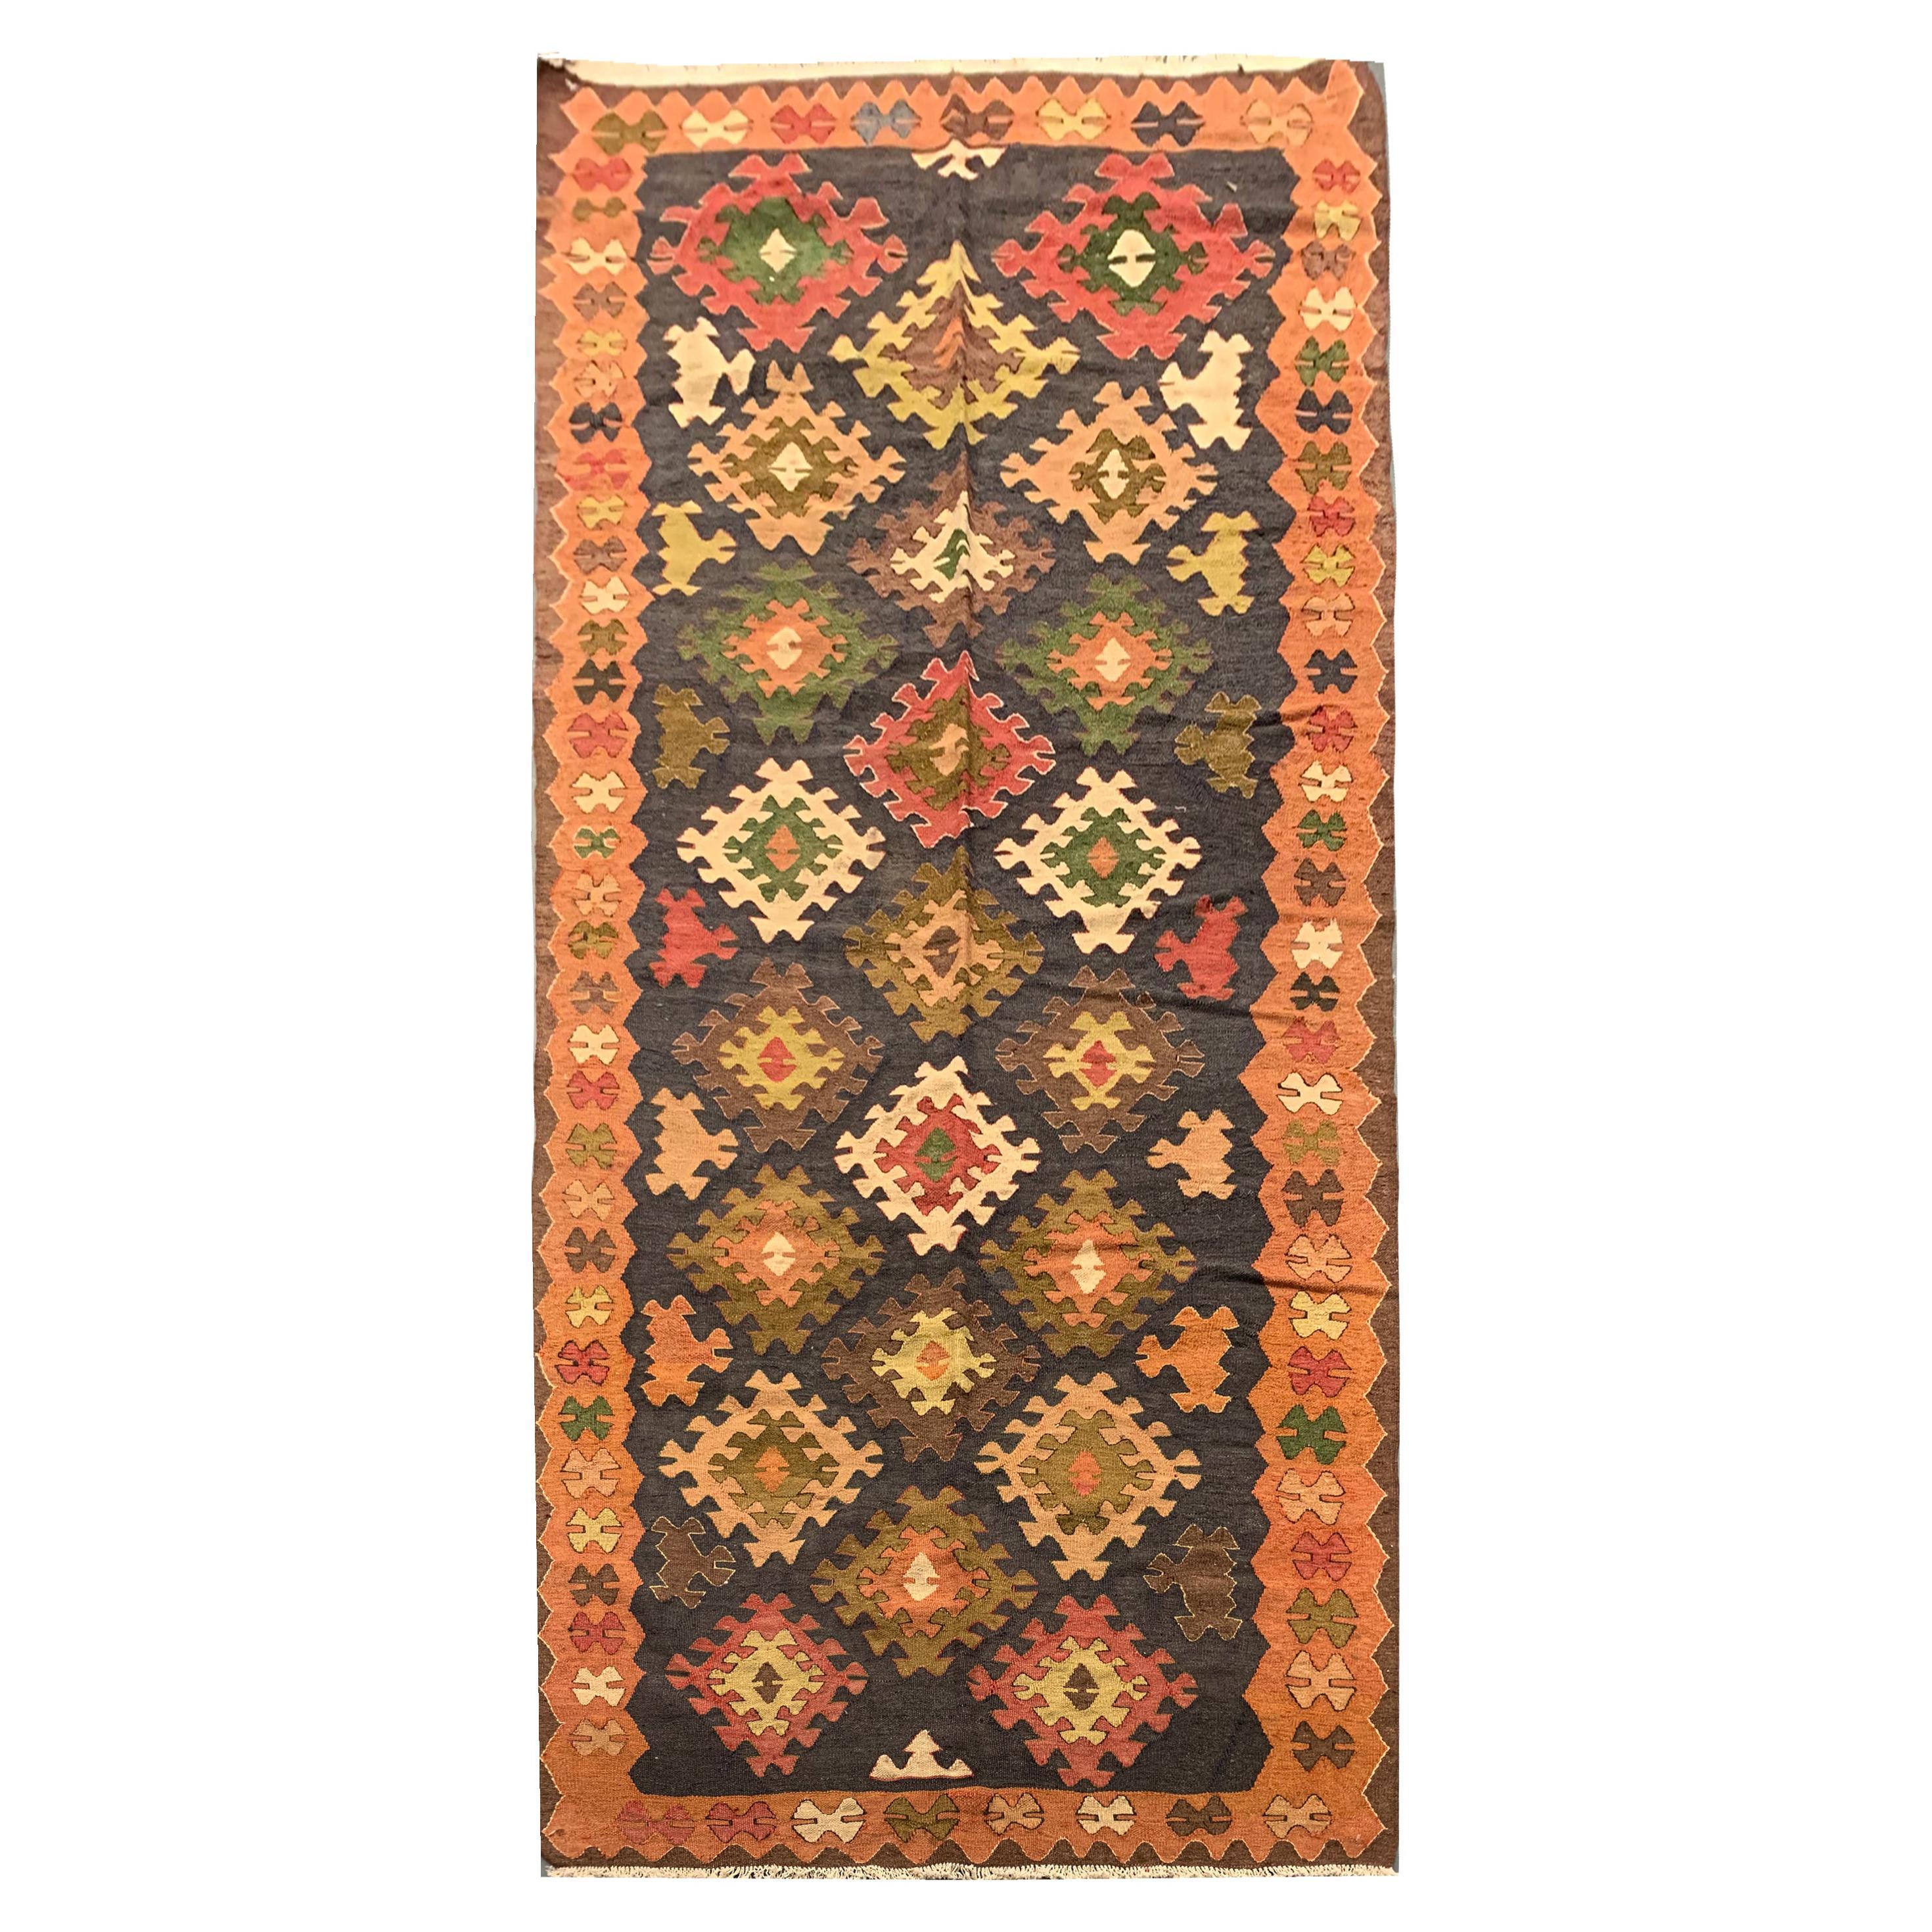 Handwoven Kilims Antique Caucasian Kilim Rug Geometric Wool Carpet